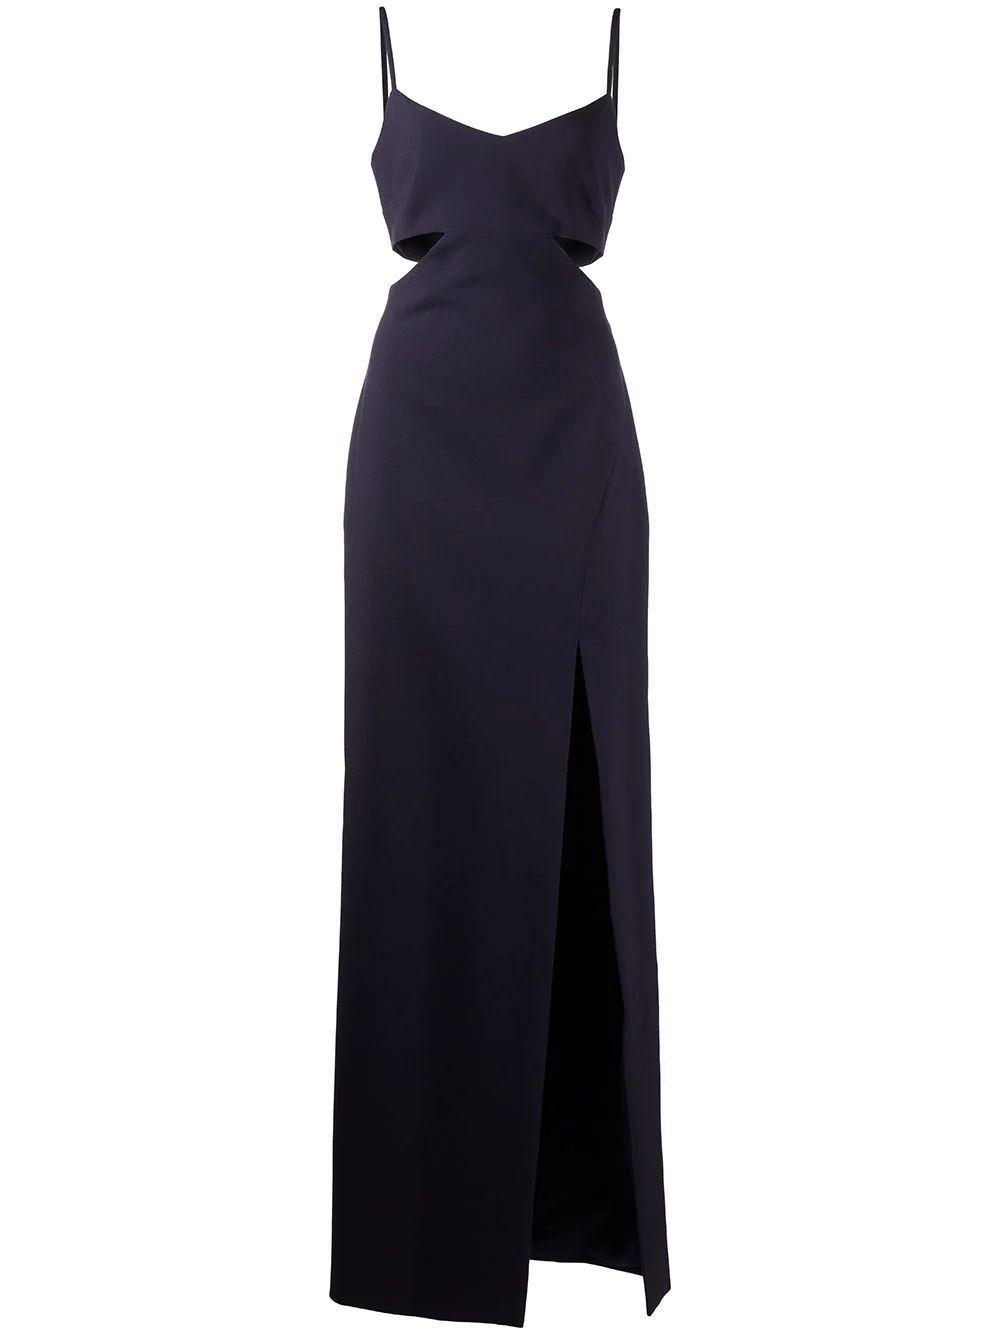 Penzi Gown Item # YD1534001LYB